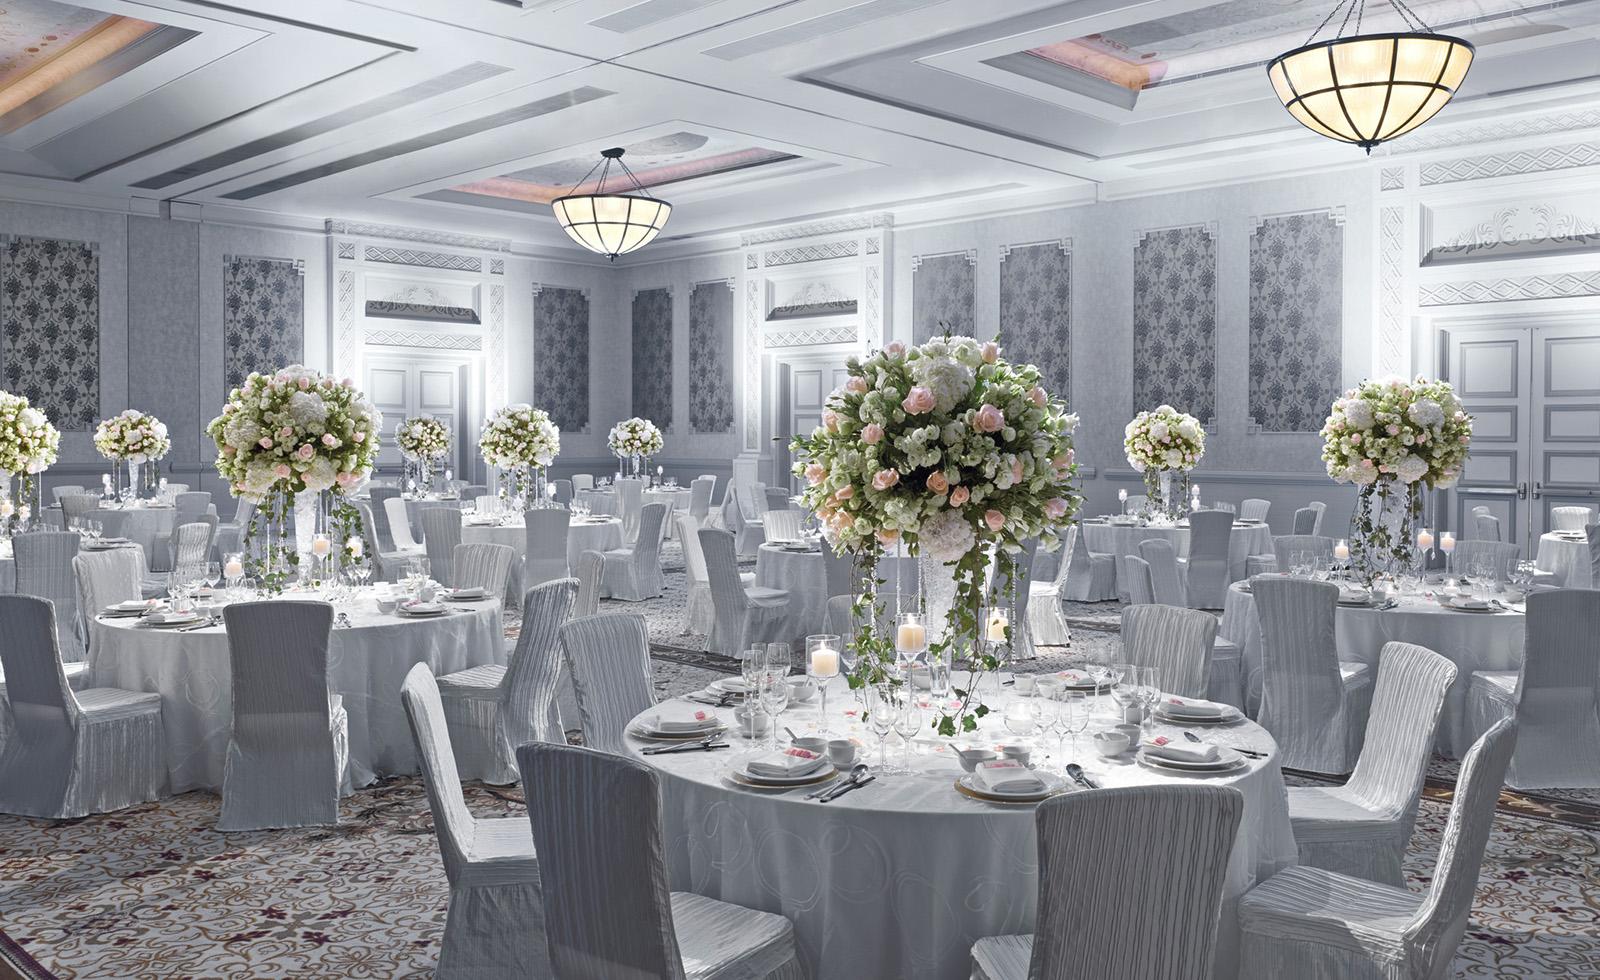 Wedding banquet setup